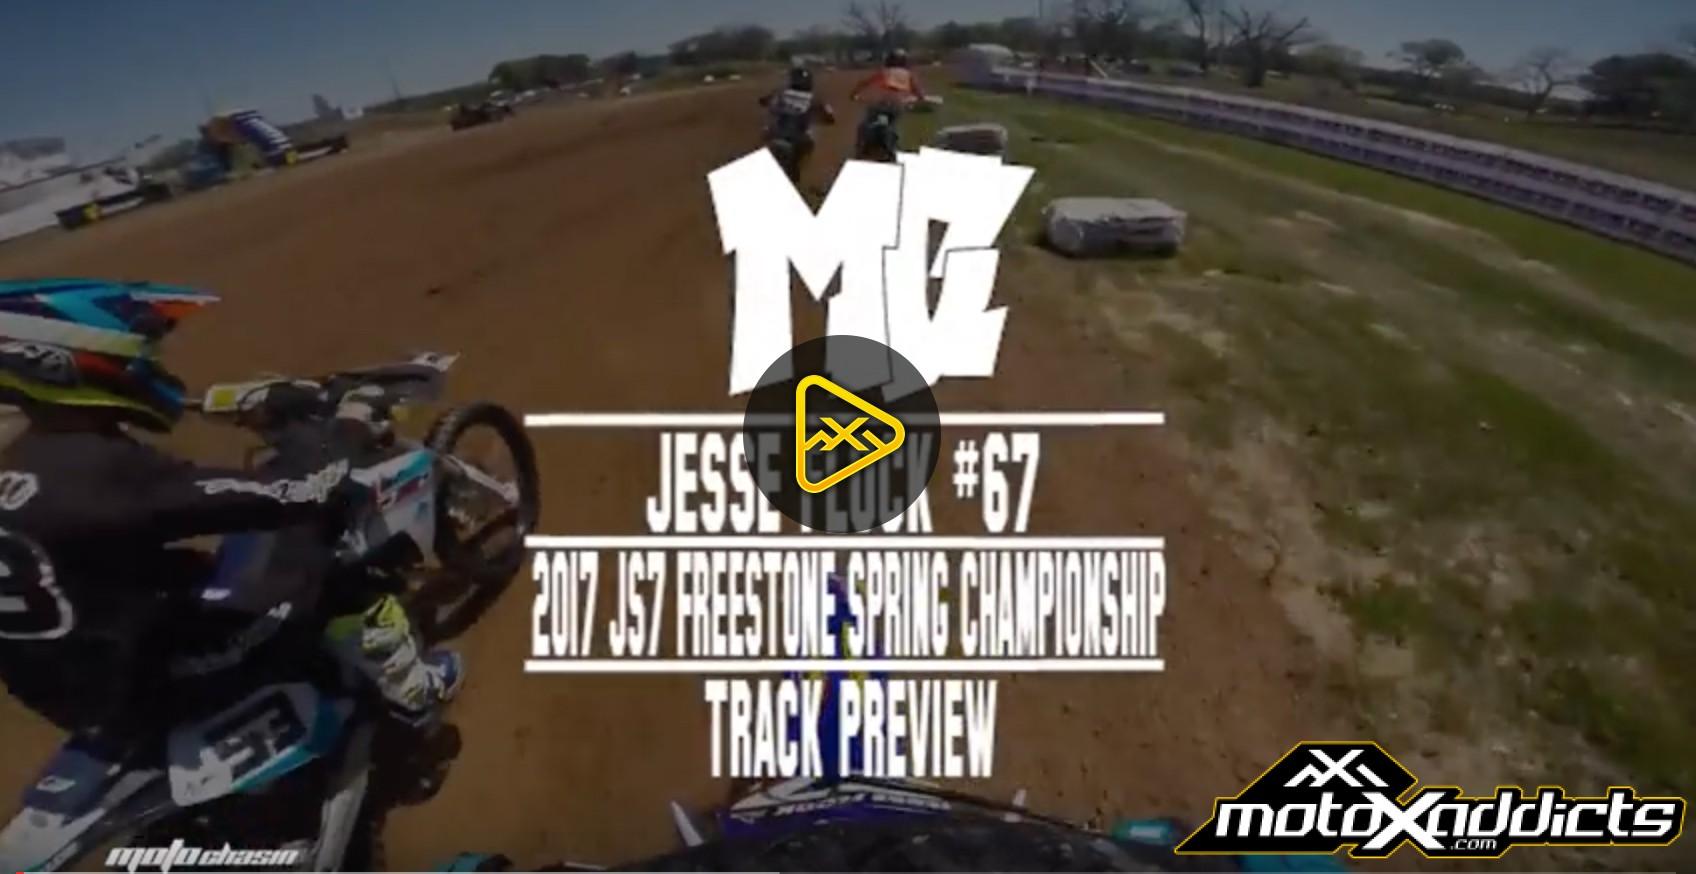 Helmet Cam: Jesse Flock 2017 JS7 Freestone Spring Championship